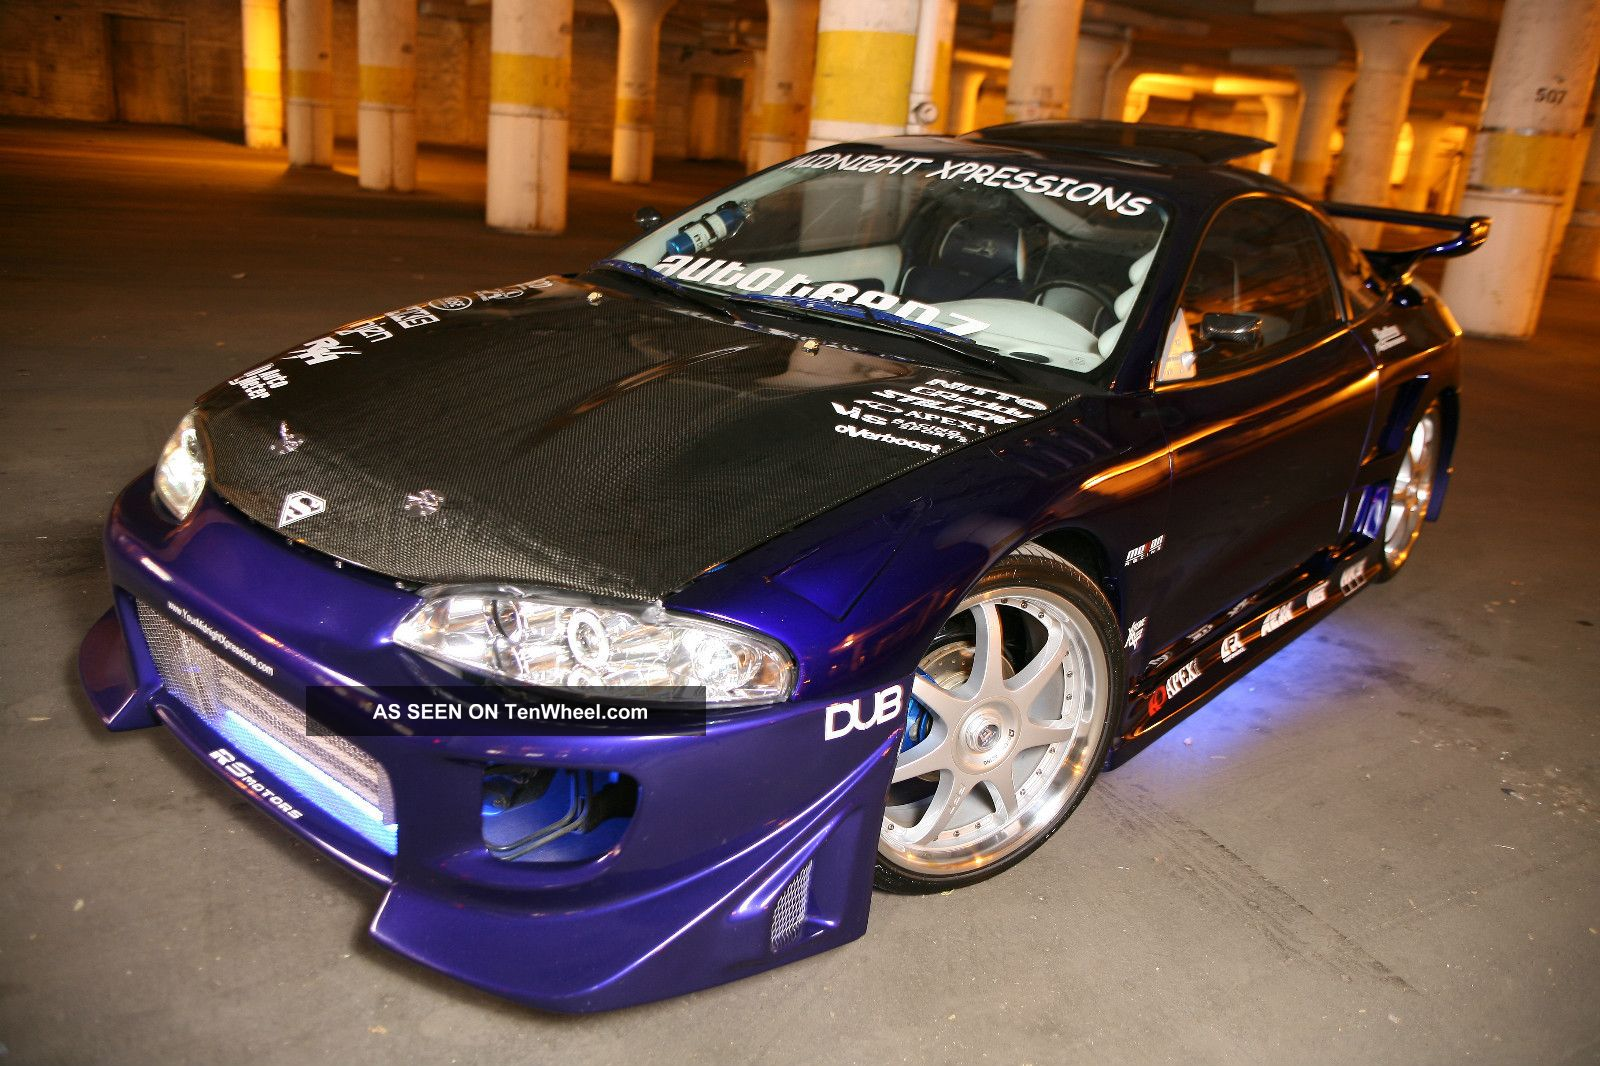 1998 Gst Dr Mitsubishi Mitsubishi Eclipse 2 1998 Turbo Gst Eclipse